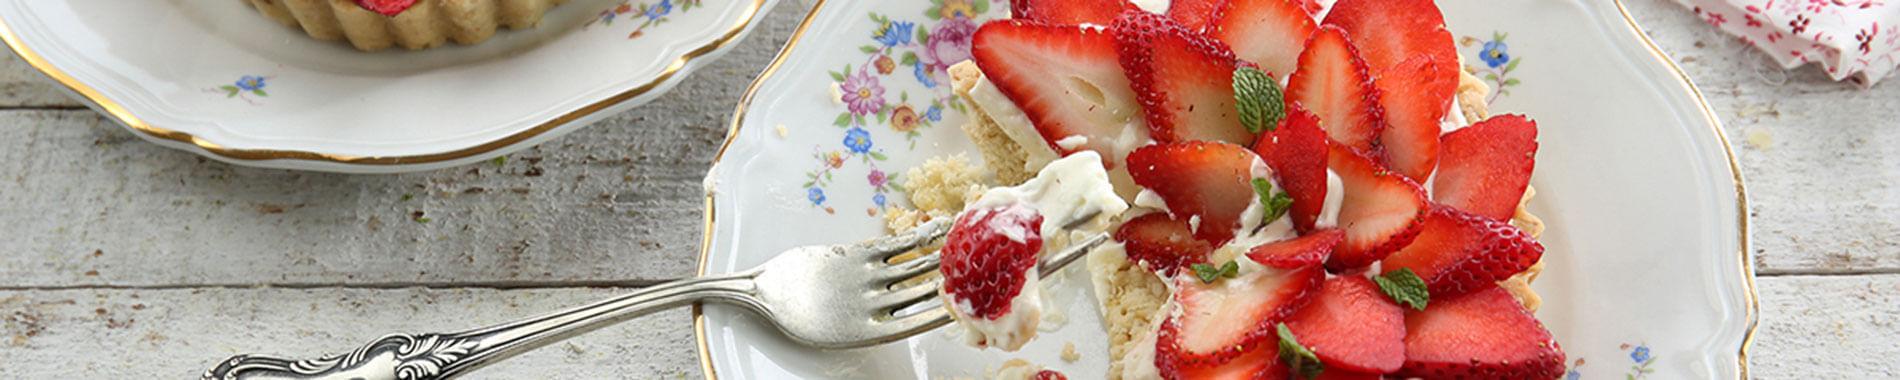 slider1-jumbo a la carta-torta-de-frutillas